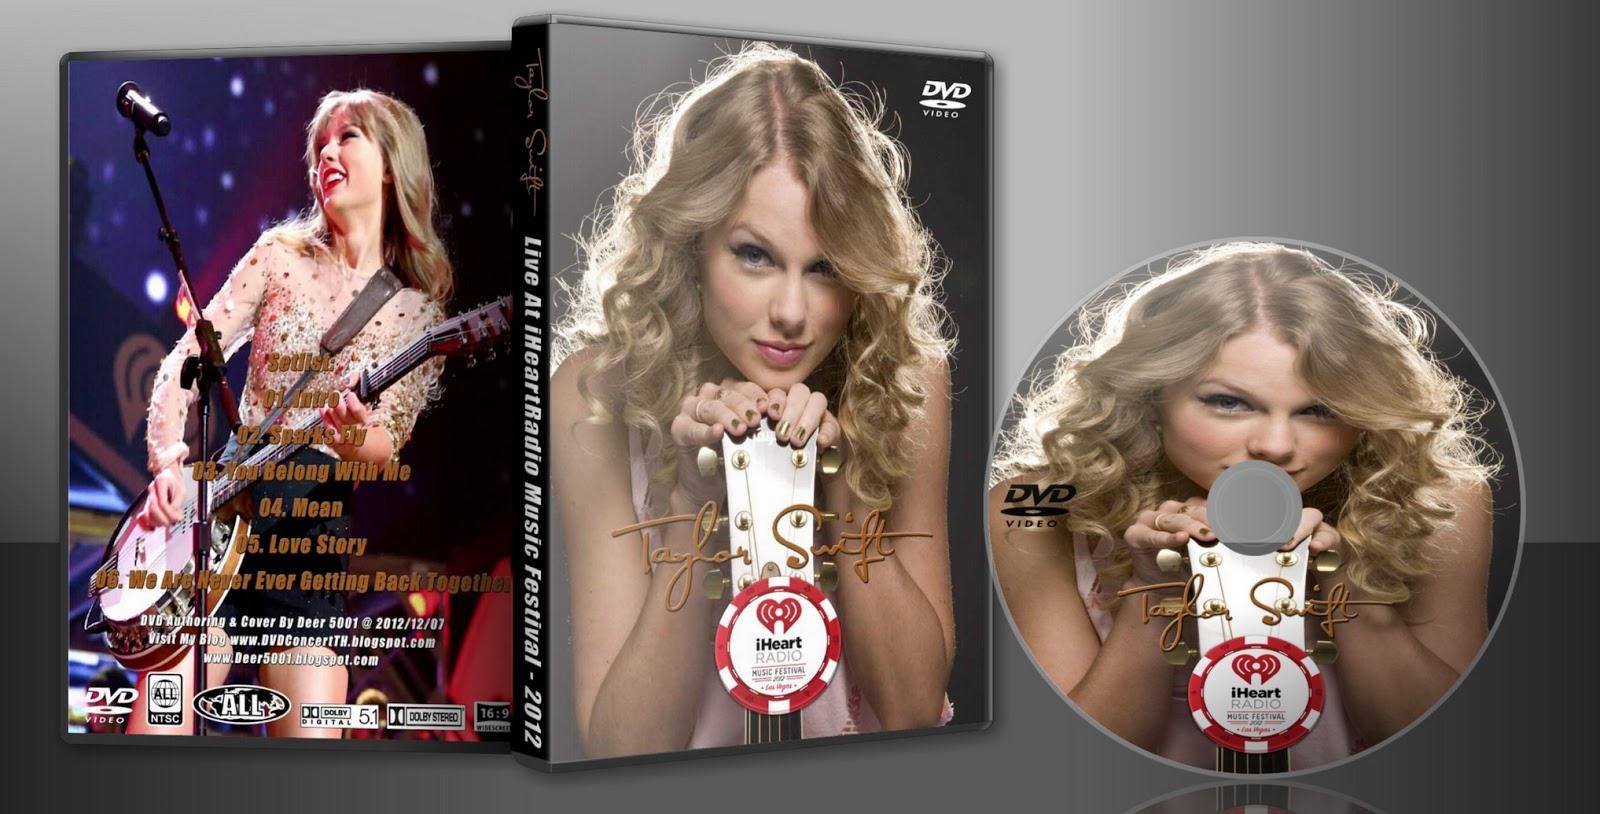 http://2.bp.blogspot.com/-LDUcrSzatRM/UMTaP9hOXbI/AAAAAAAAI1o/QjzHdHjEy4w/s1600/DVD+Cover+For+Show+-+Taylor+Swift+-+iHeartRadio+Music+Festival+-+2012.jpg